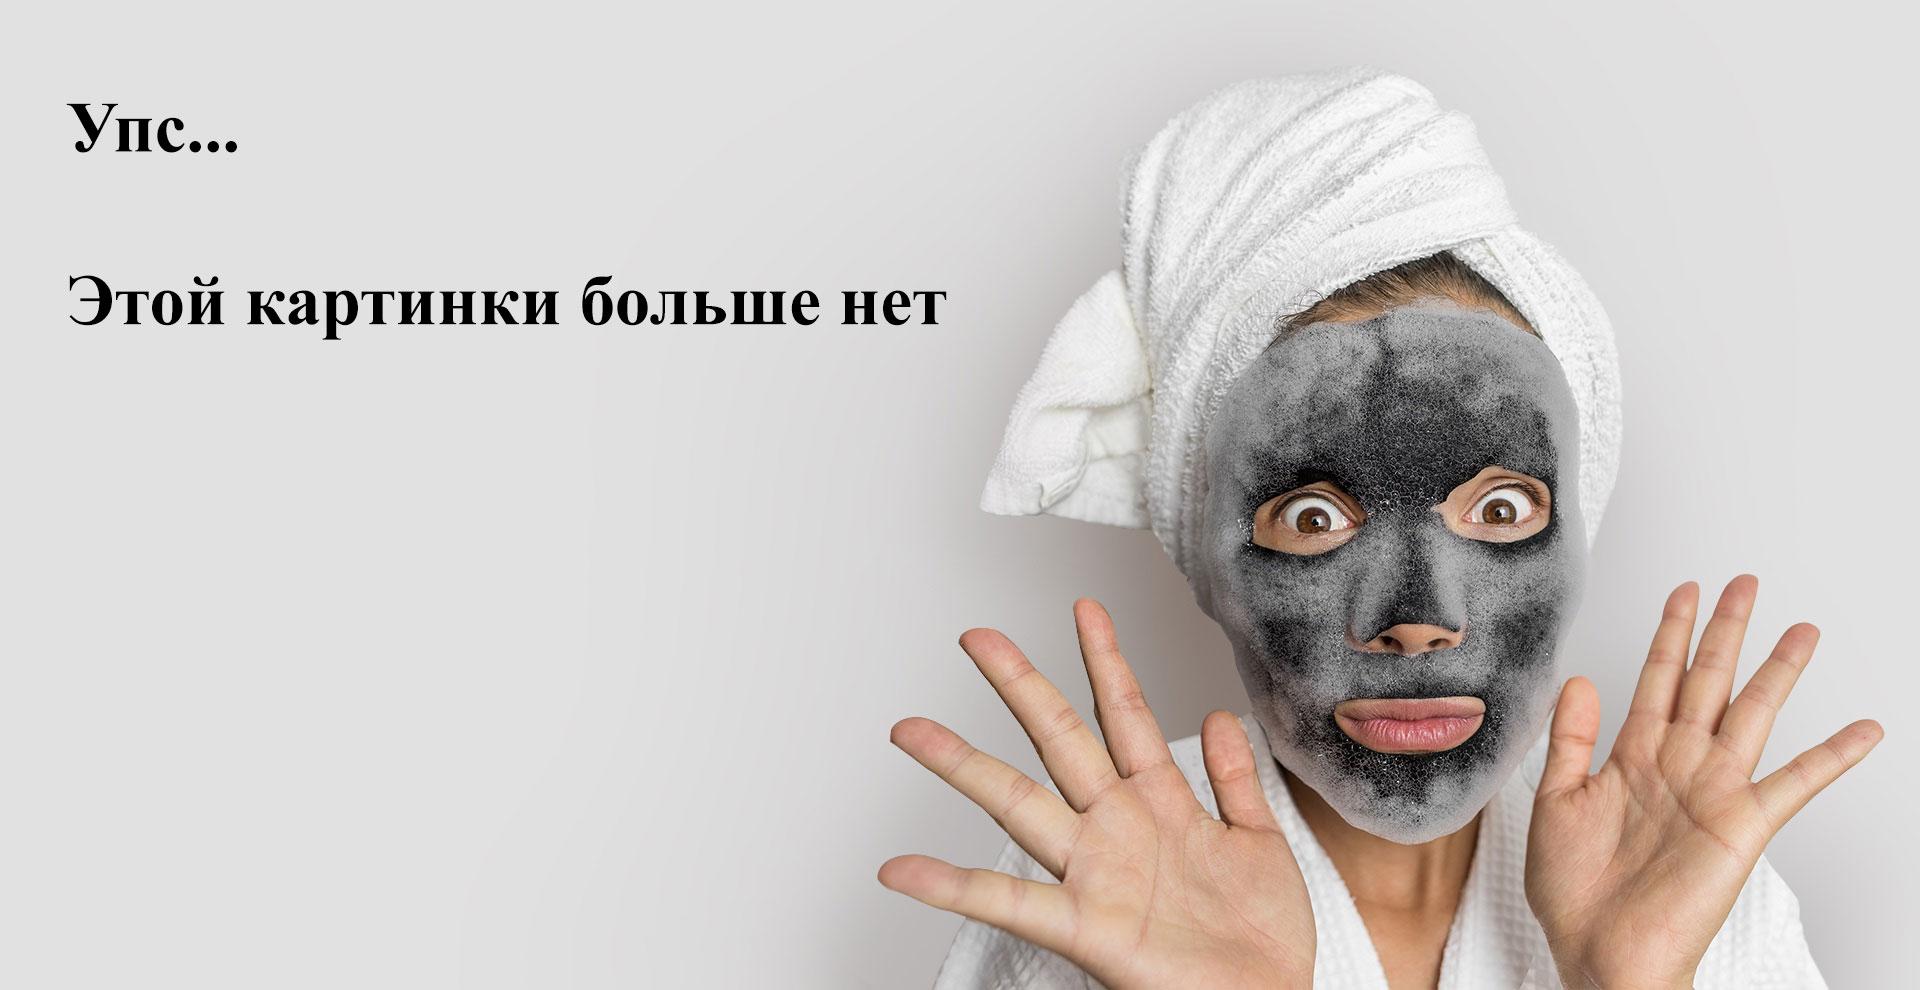 Patrisa nail, Глиттер-пудра №71, голографическая